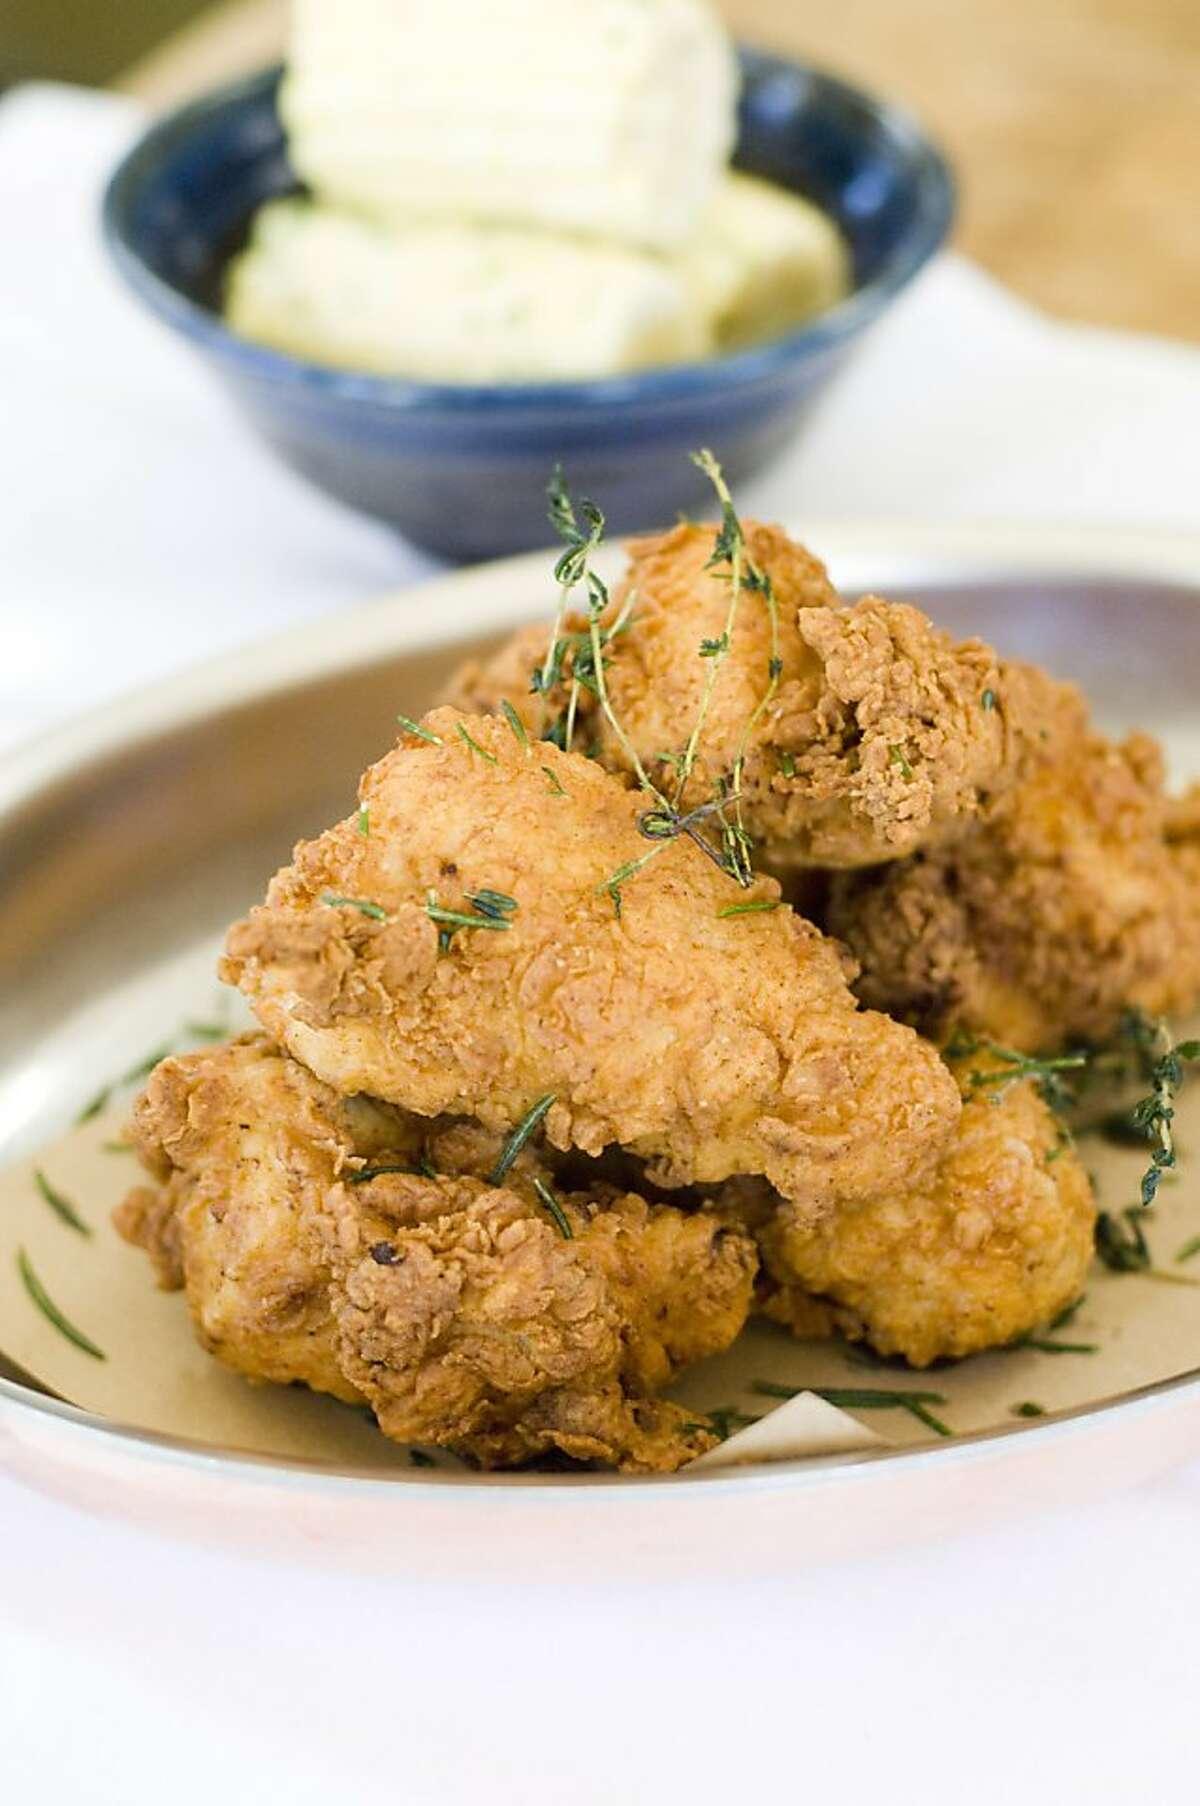 Fried chicken at Addendum, an offshoot of Thomas Keller's Ad Hoc.